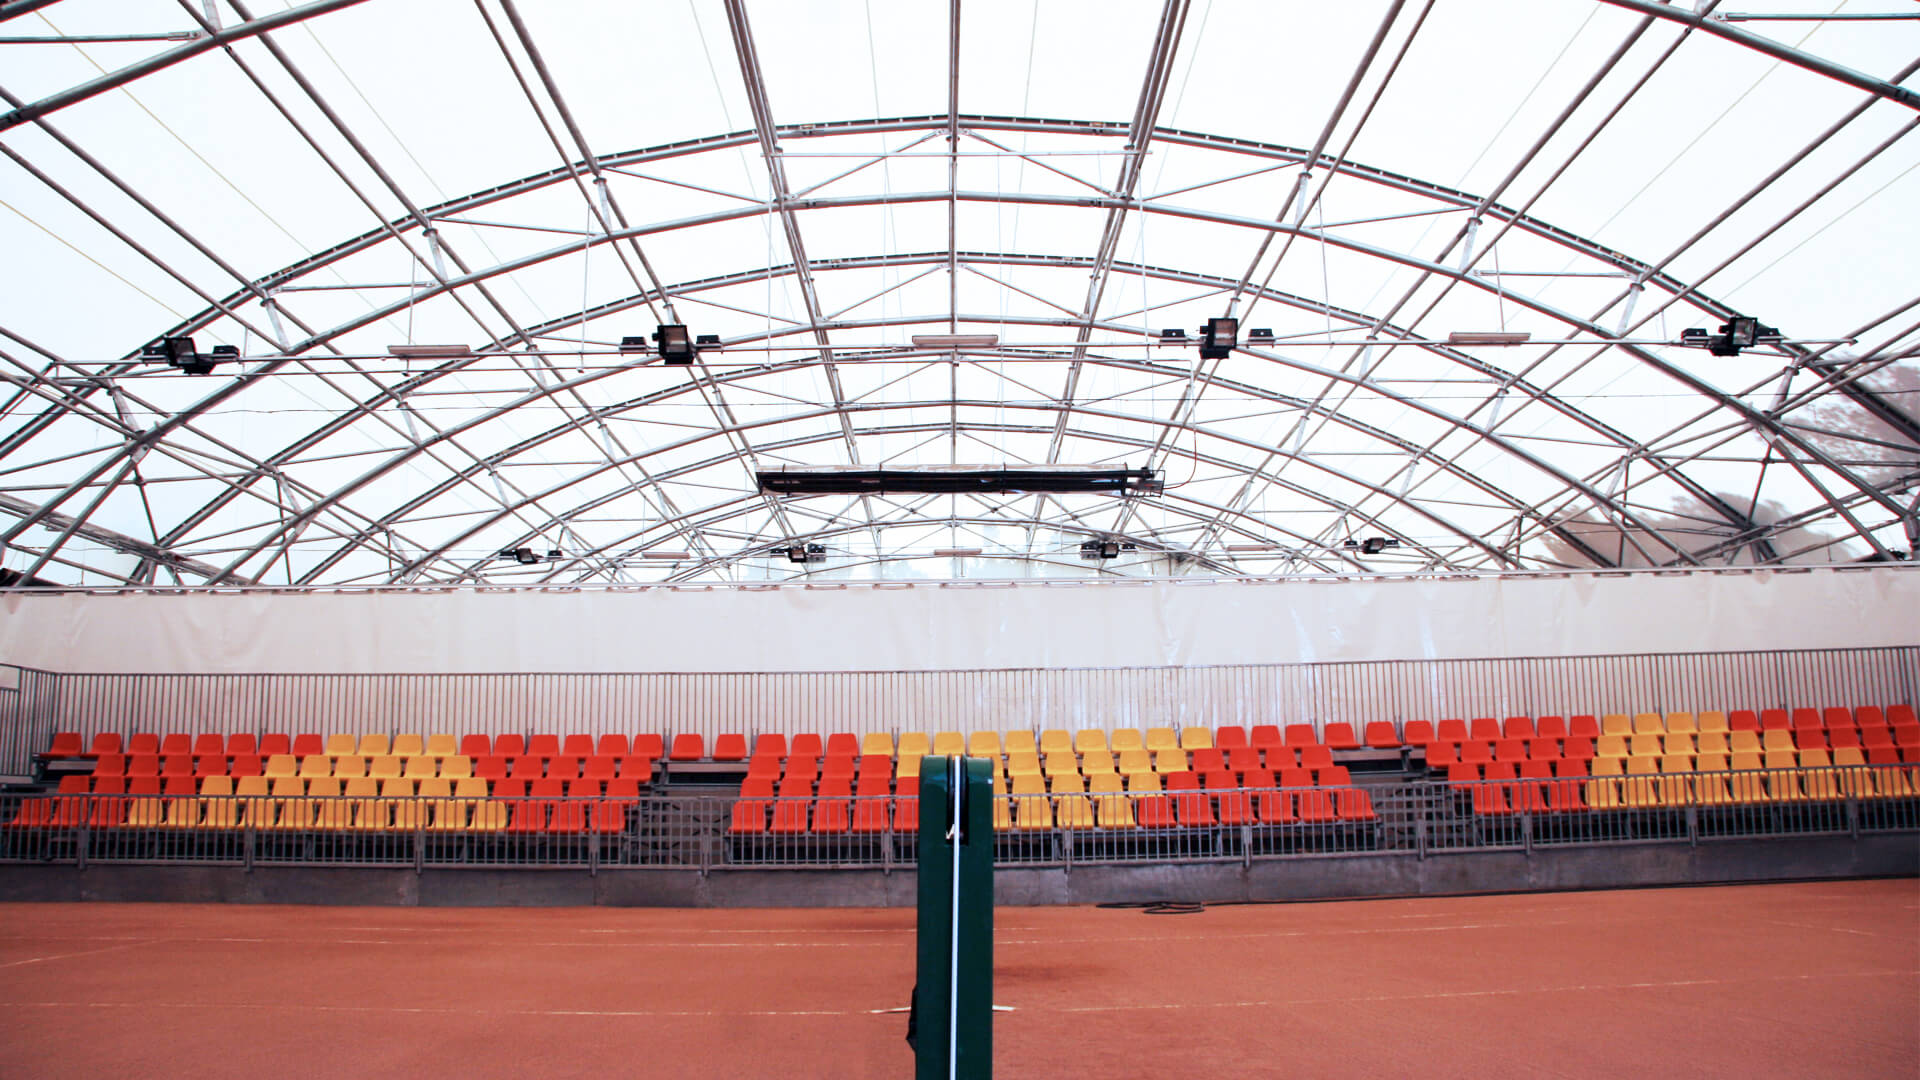 payam-complex-tennis-court-tensile-roof-atlas-slideshow